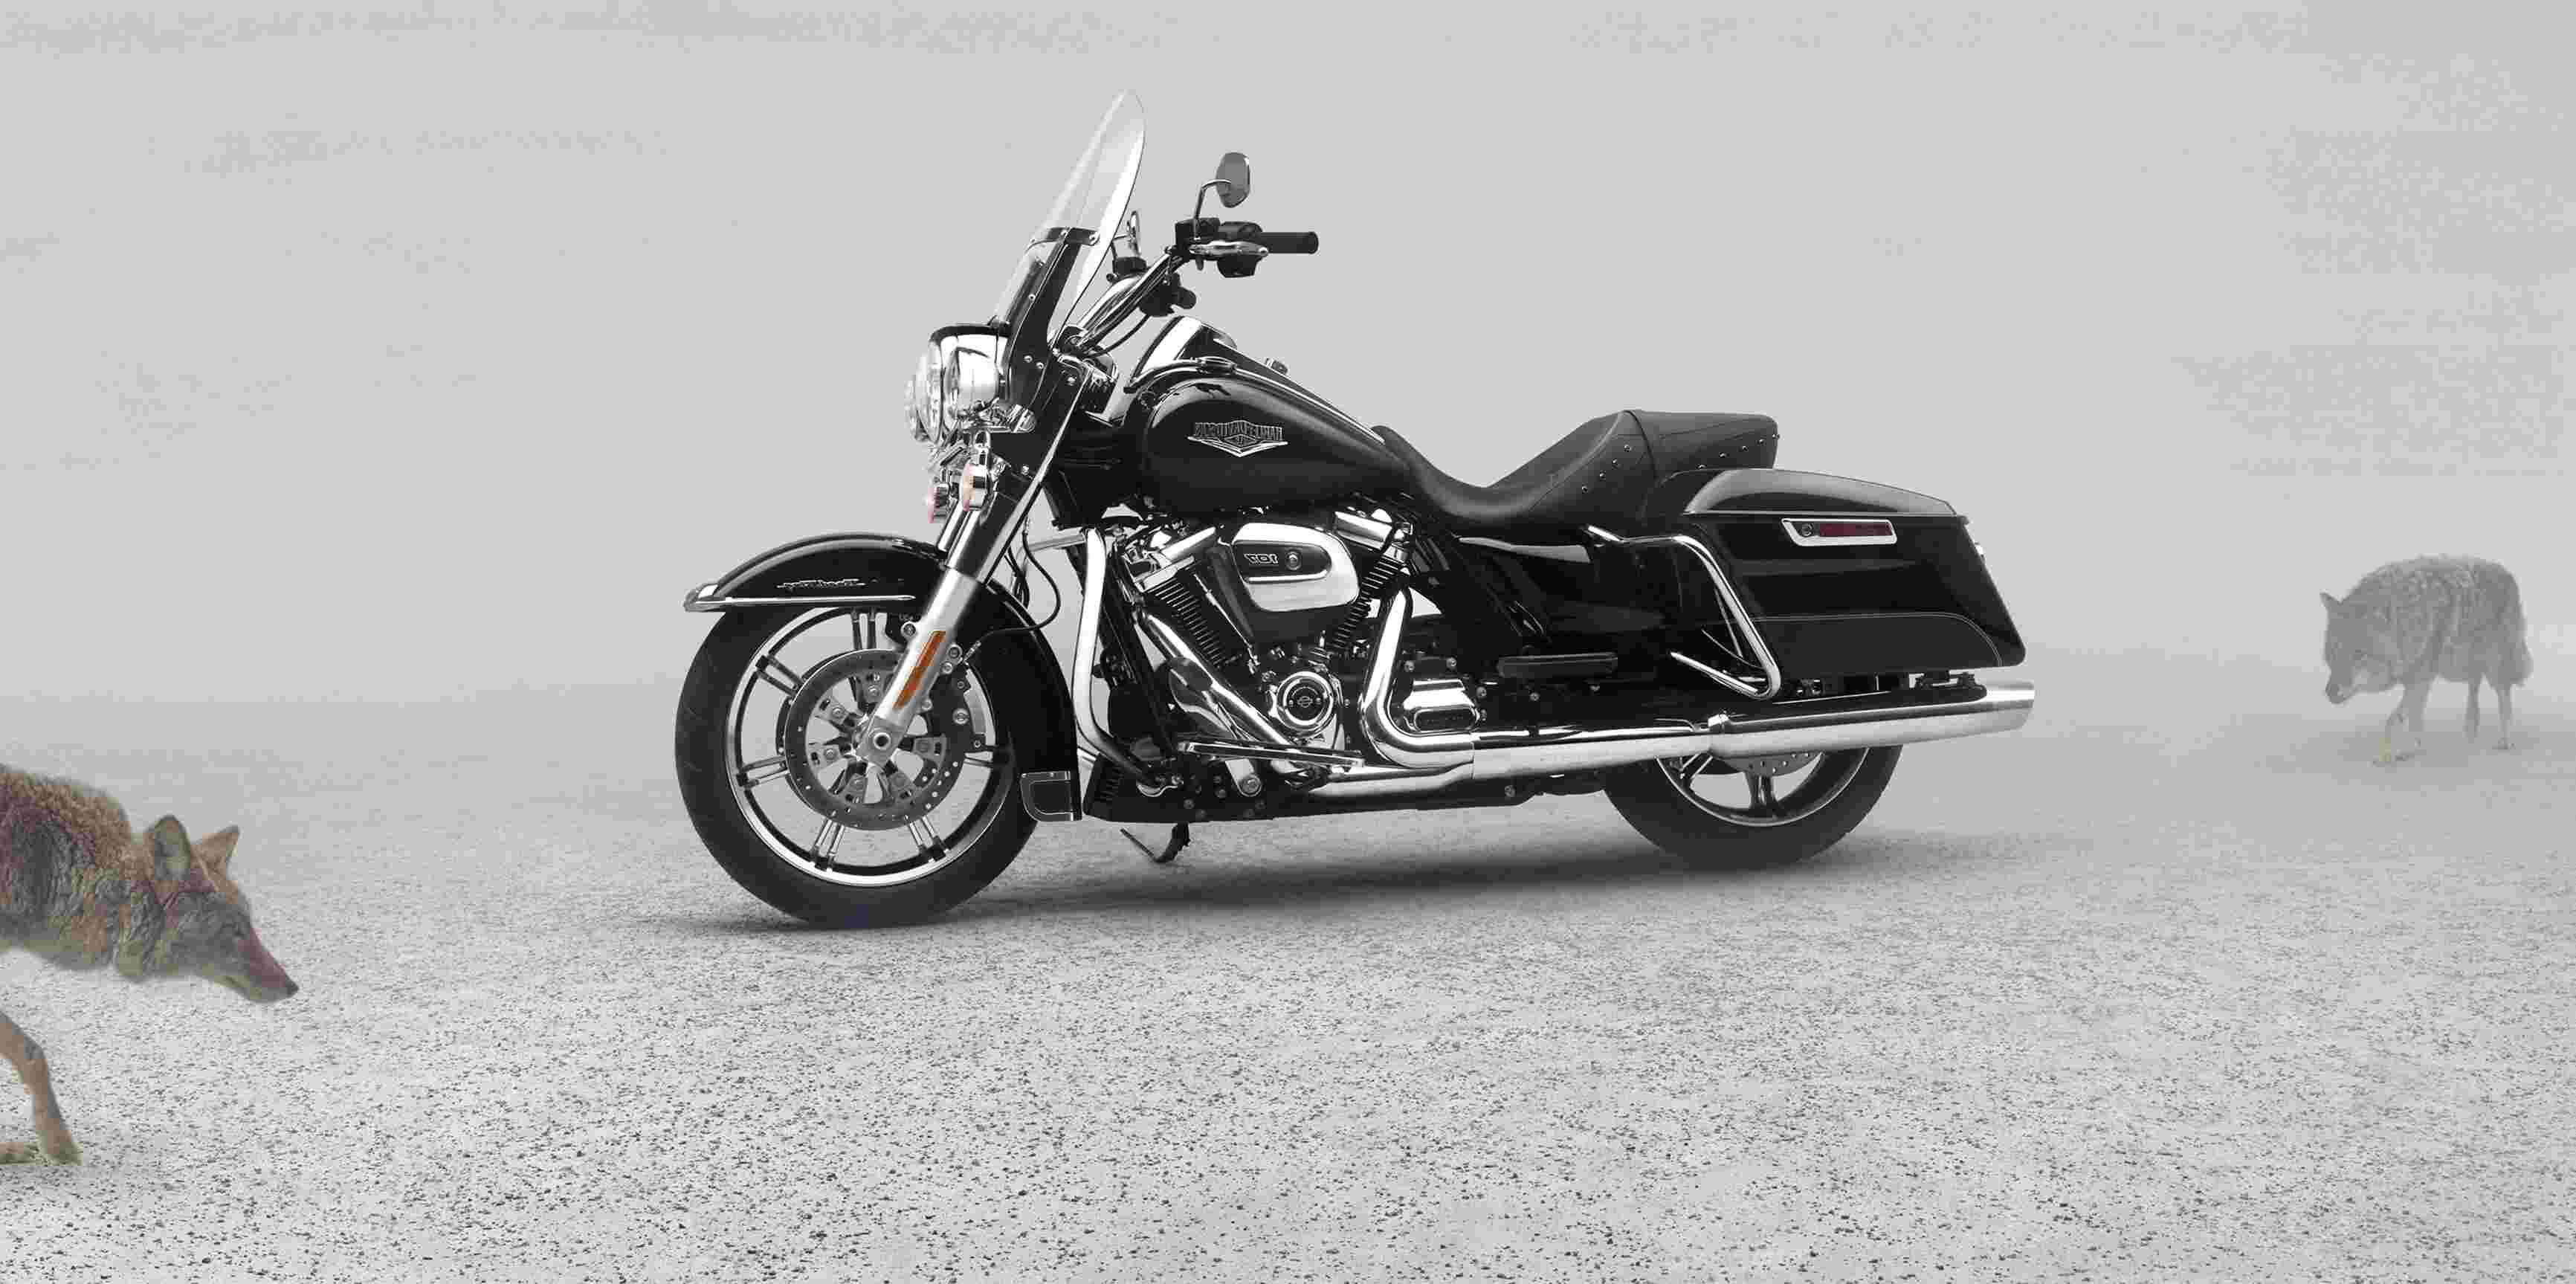 Road King Harley Davidson Comprar Usado No Brasil 146 Road King Harley Davidson Em Segunda Mao